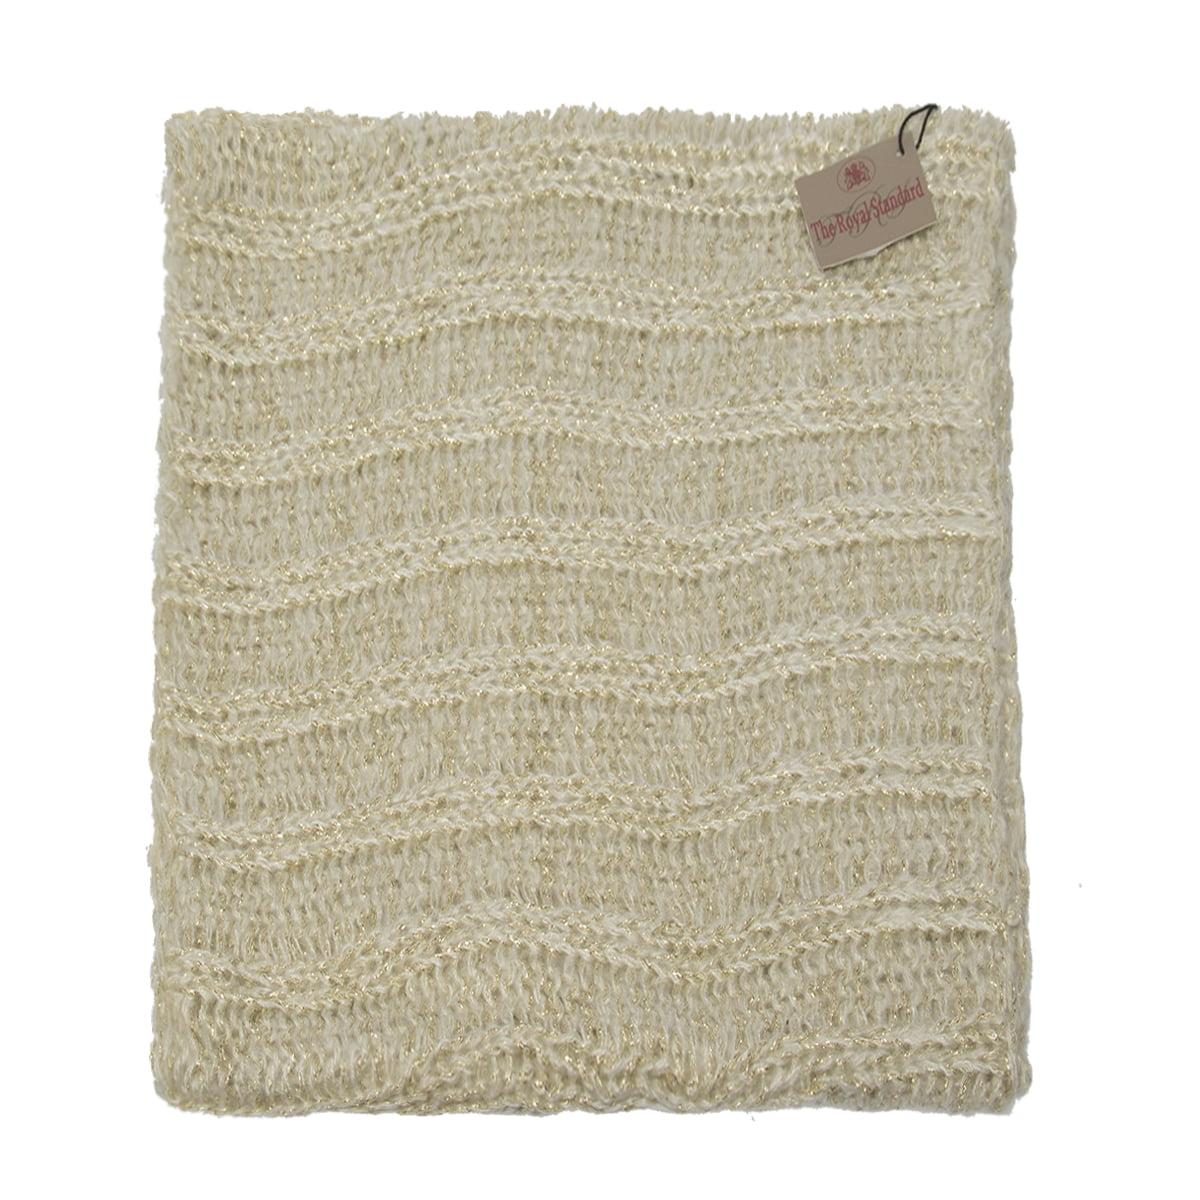 16bf4b56786b2 The Royal Standard - The Royal Standard Infinity Scarf Cute Winter Scarf  For Women Warm Lightweight Wrap Metallic Loose Knit - Walmart.com